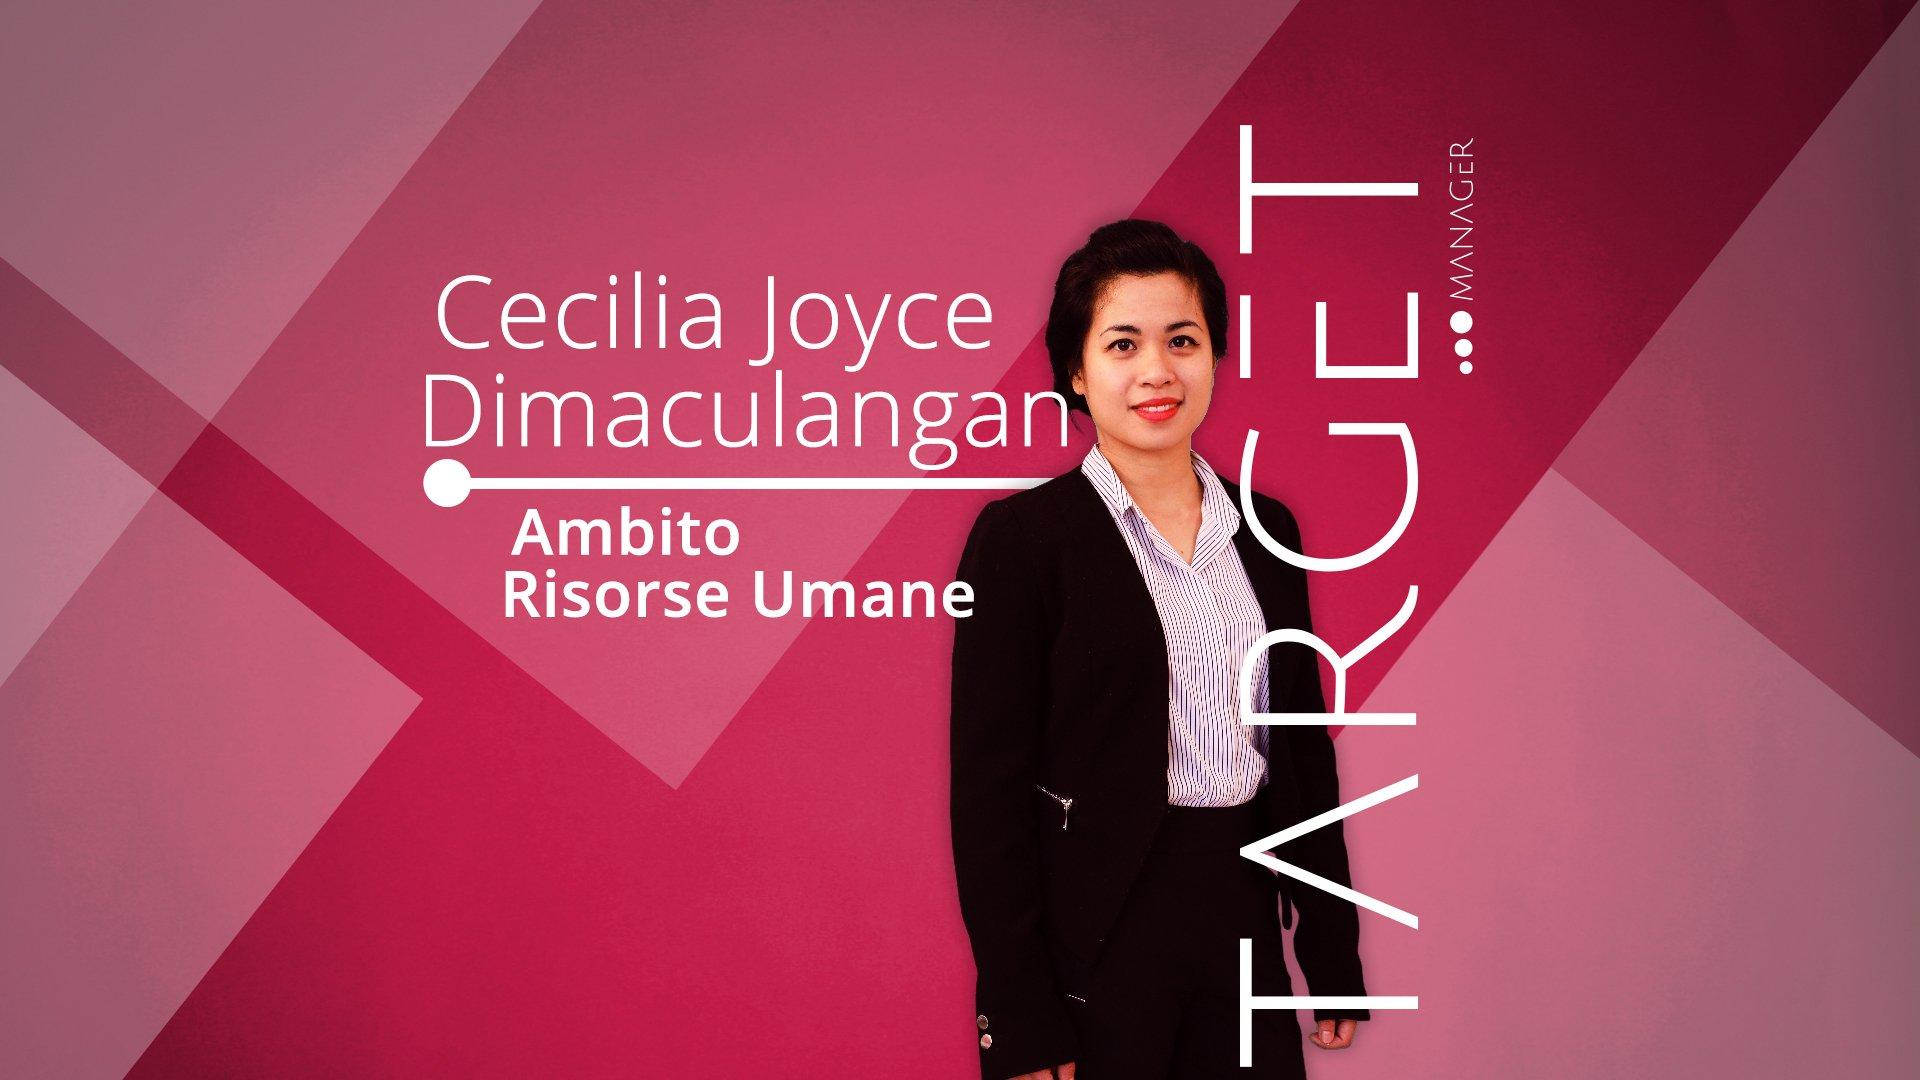 Cecilia Joyce Dimaculangan